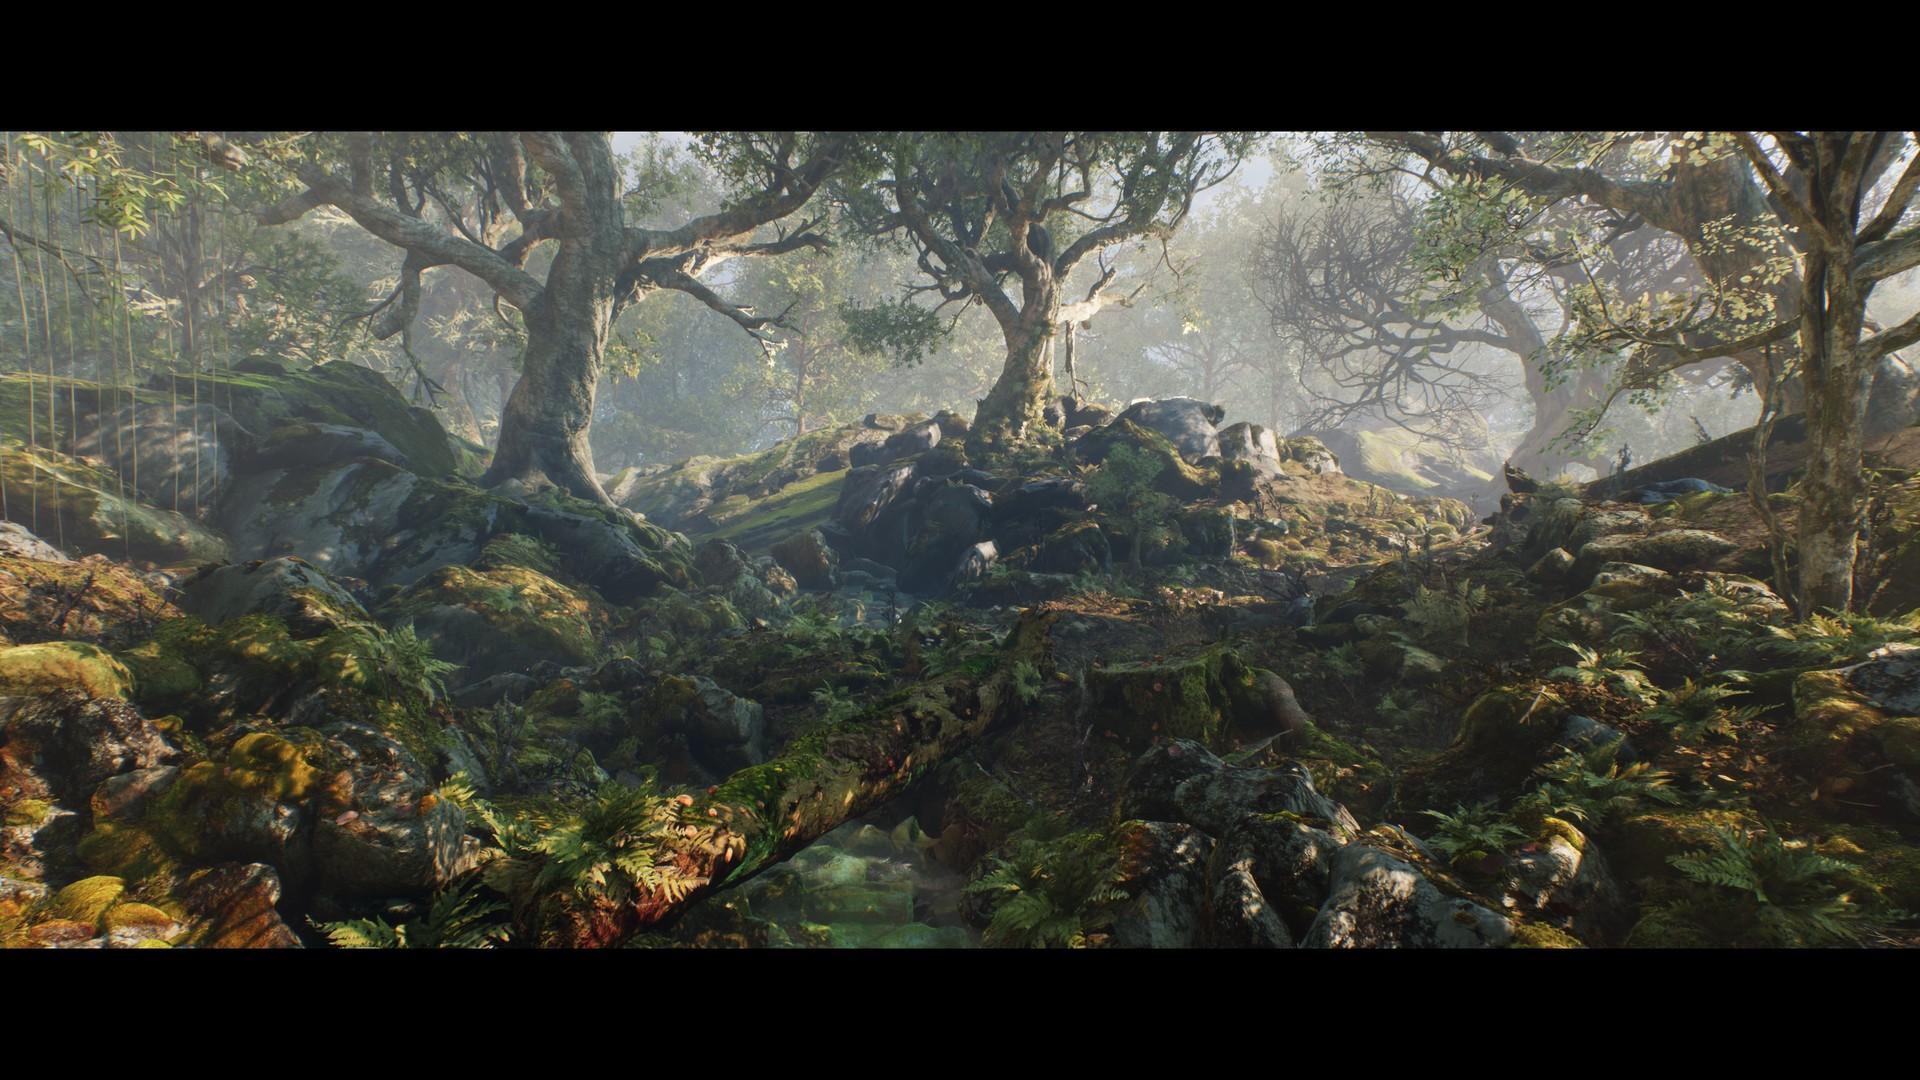 Download Unreal Engine 4 19 4 20 Uparchvip